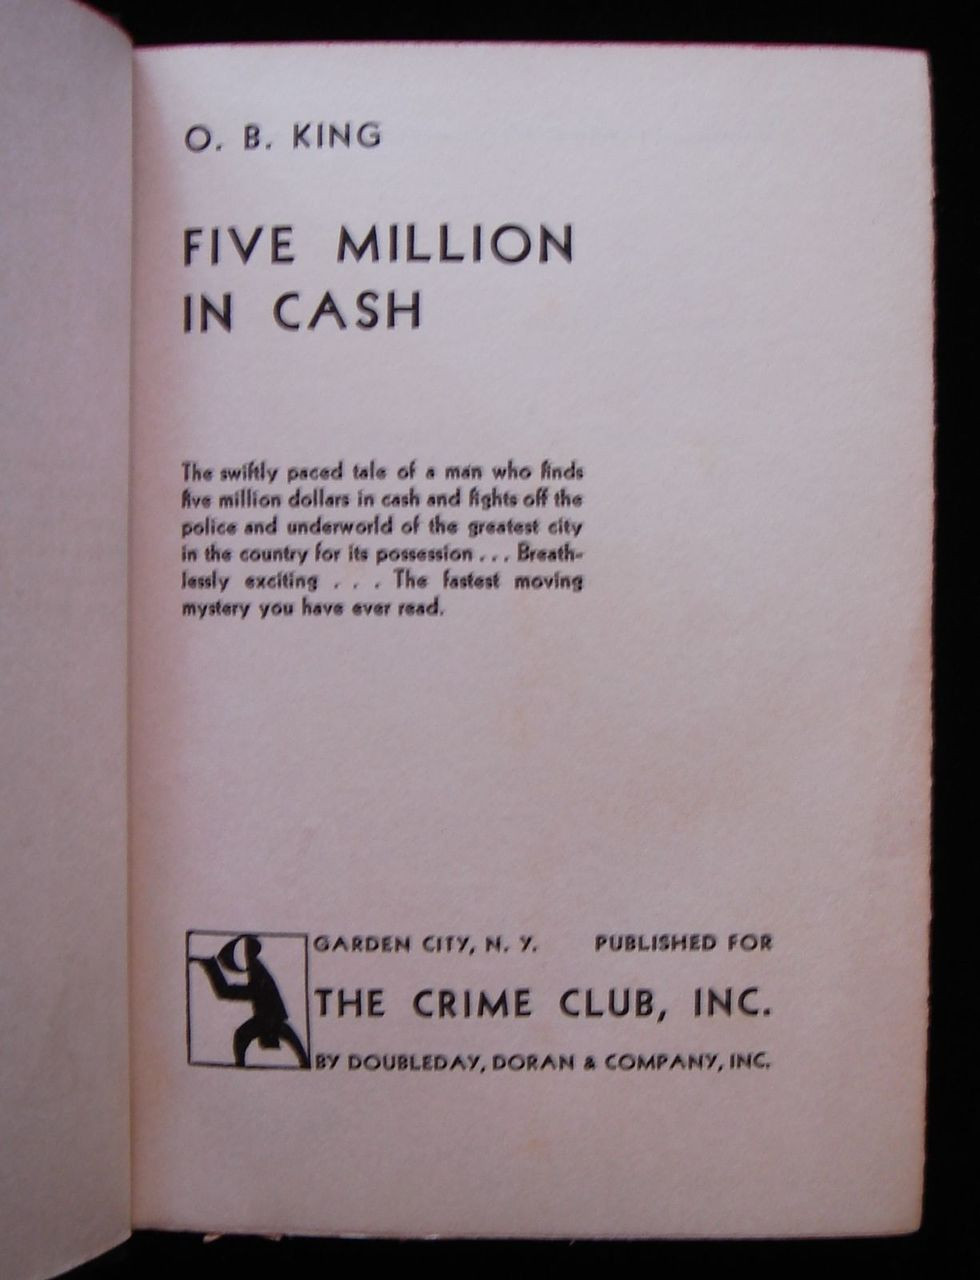 5 MILLION IN CASH, by O. B. King - 1932 [1st Ed]